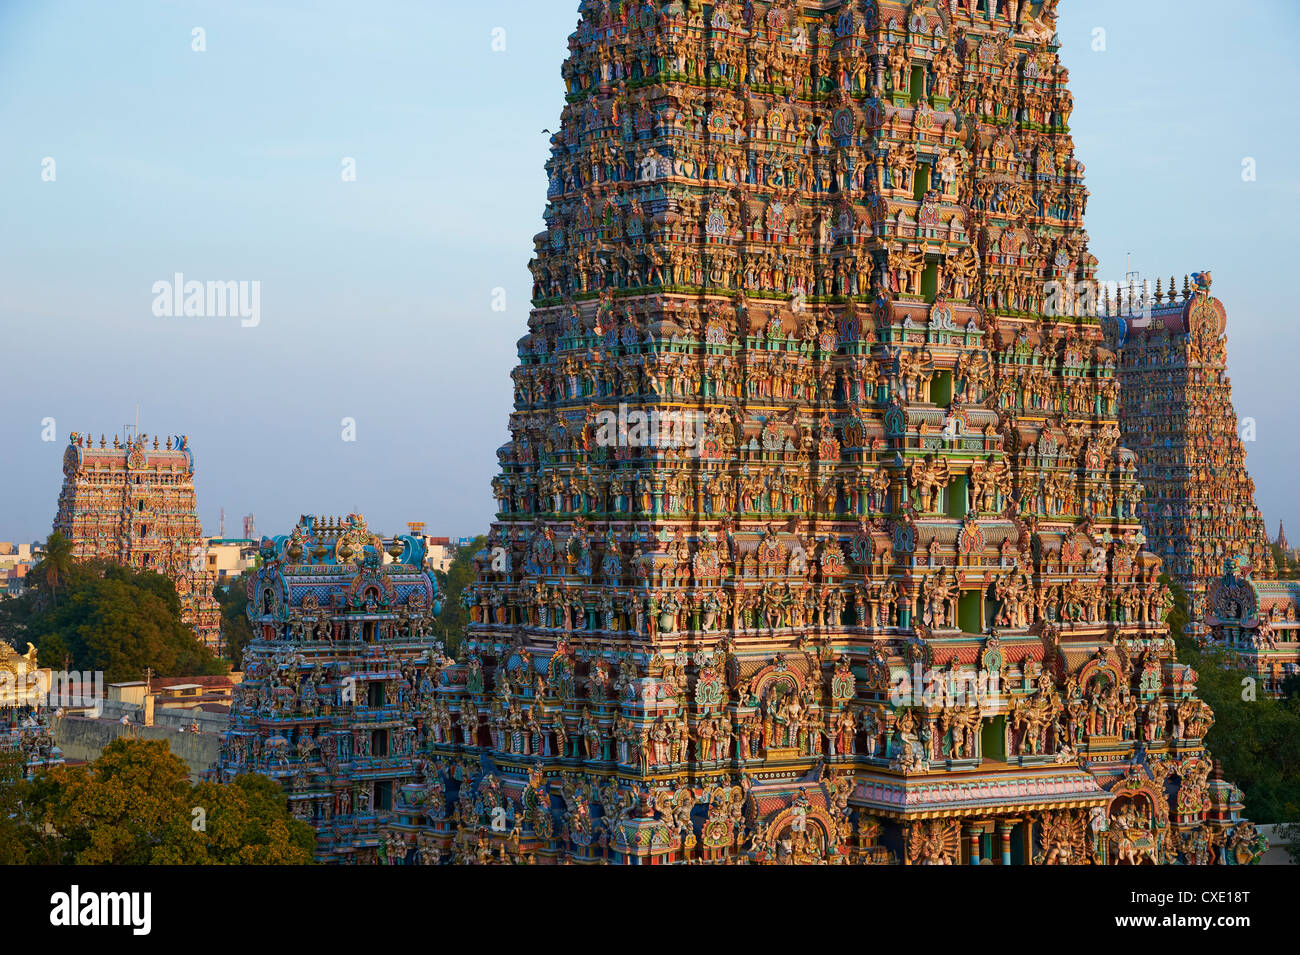 Sri Meenakshi temple, Madurai, Tamil Nadu, India, Asia Imagen De Stock